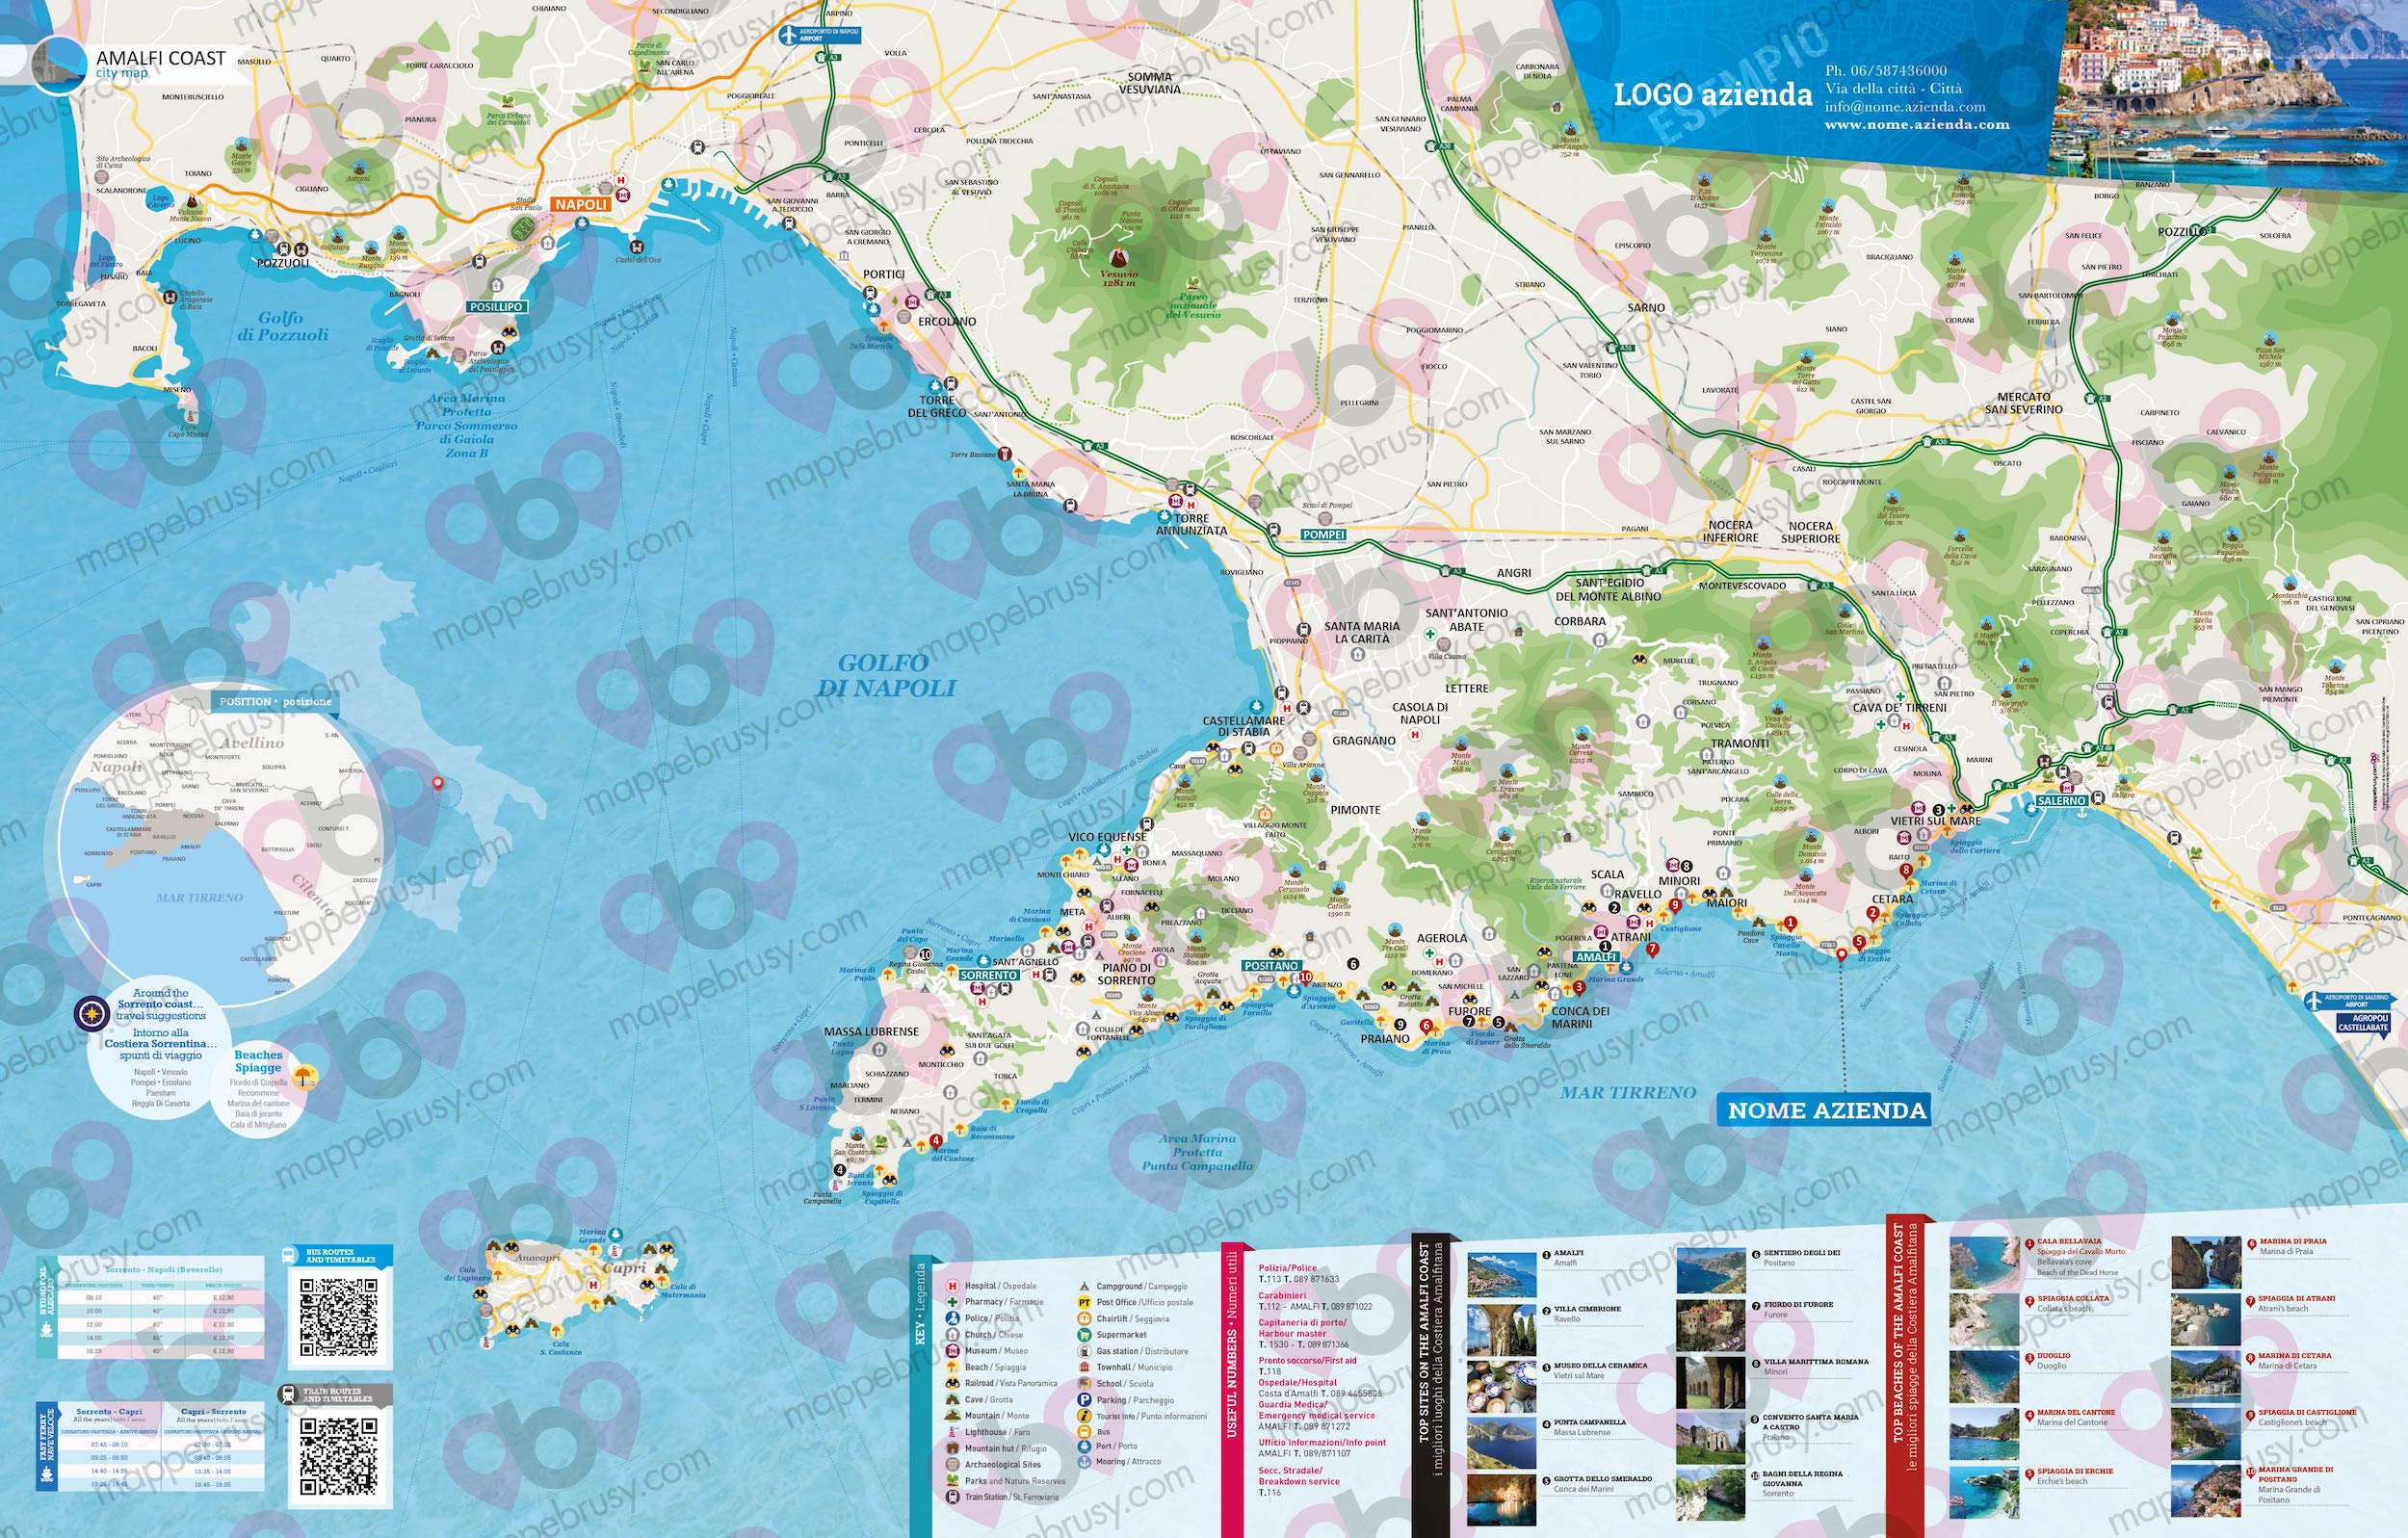 Tour Costiera Amalfitana Cartina.Costiera Amalfitana Mappe Brusy